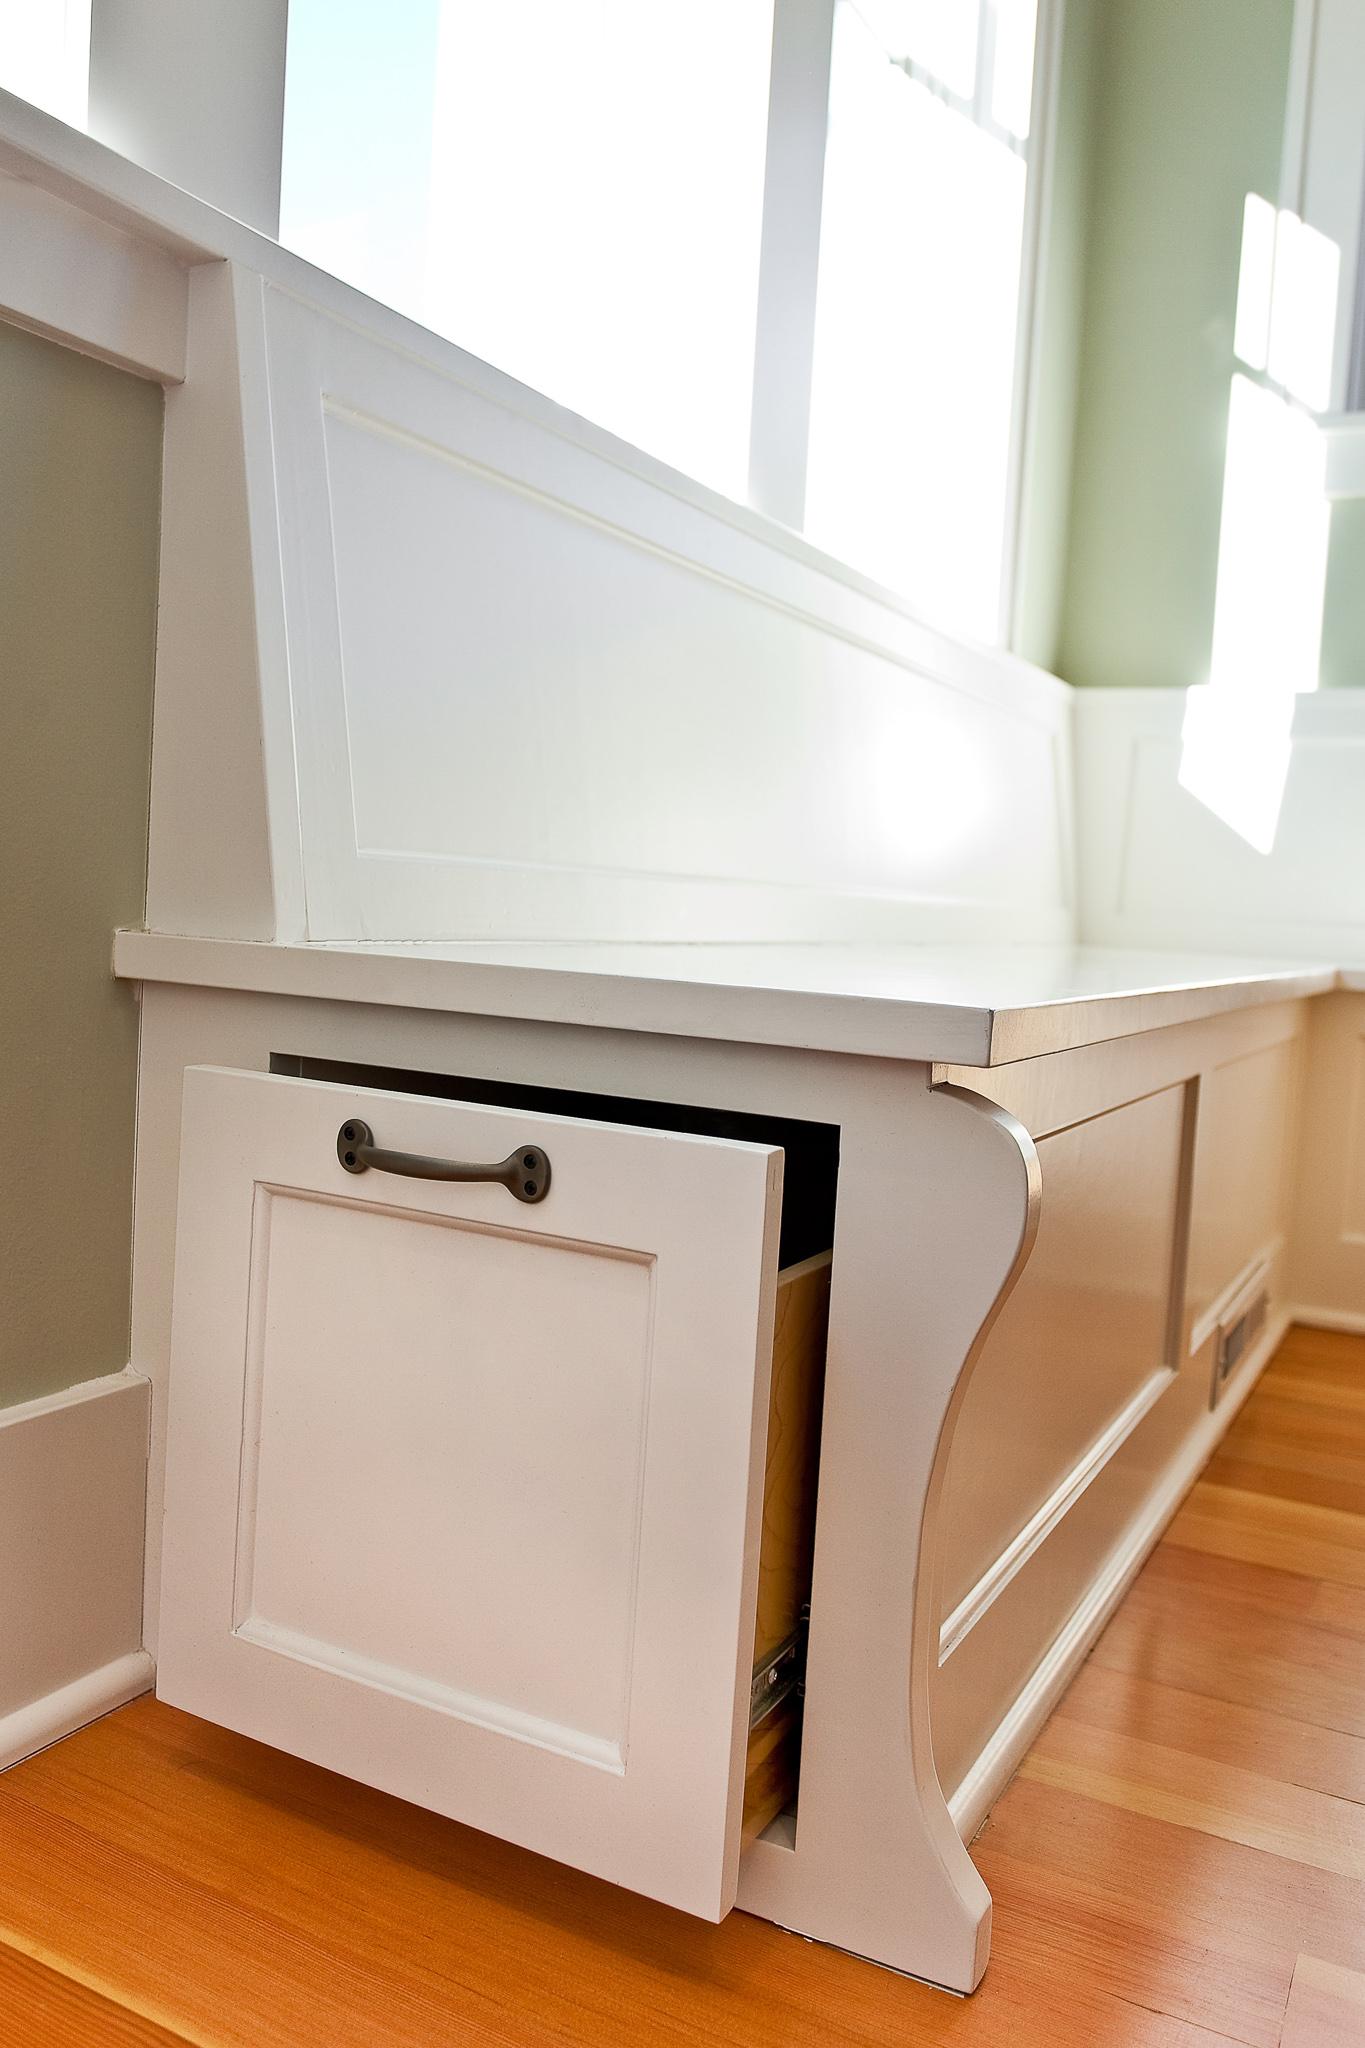 BALLARD Kitchen and Mudroom Remodel 14.jpg